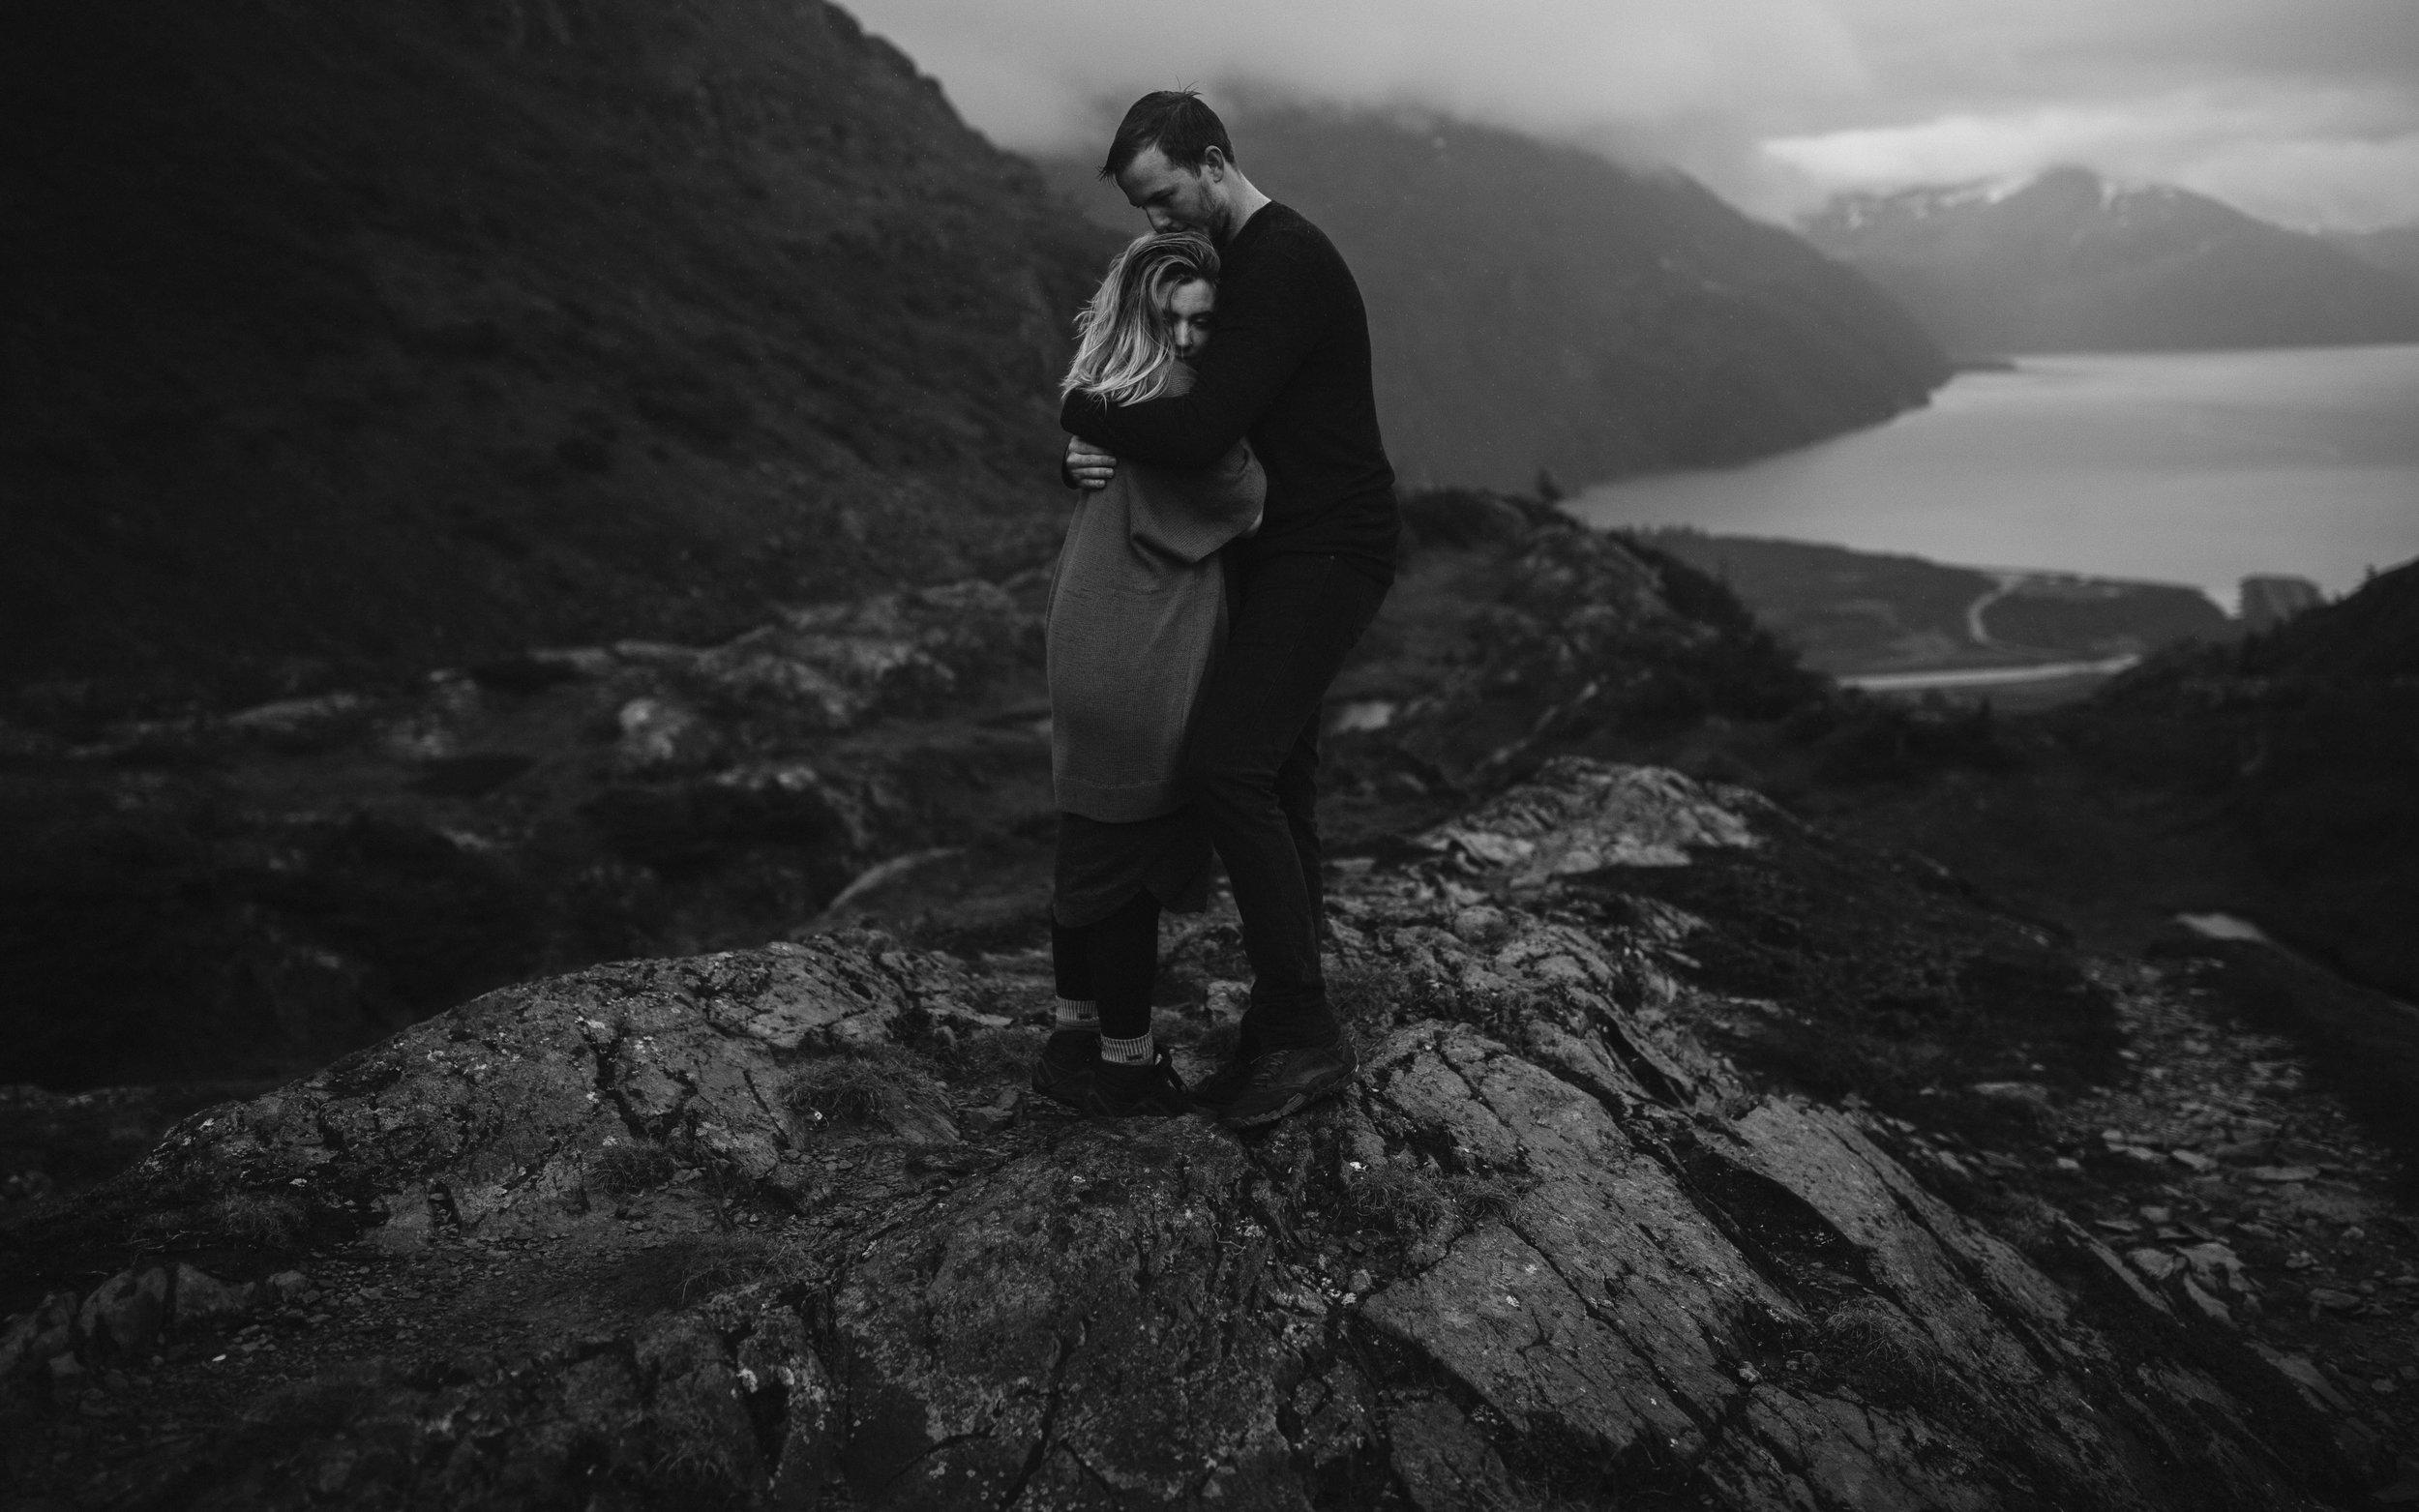 ariel-lynn-alaskan-mountain-couples-session-18.jpg